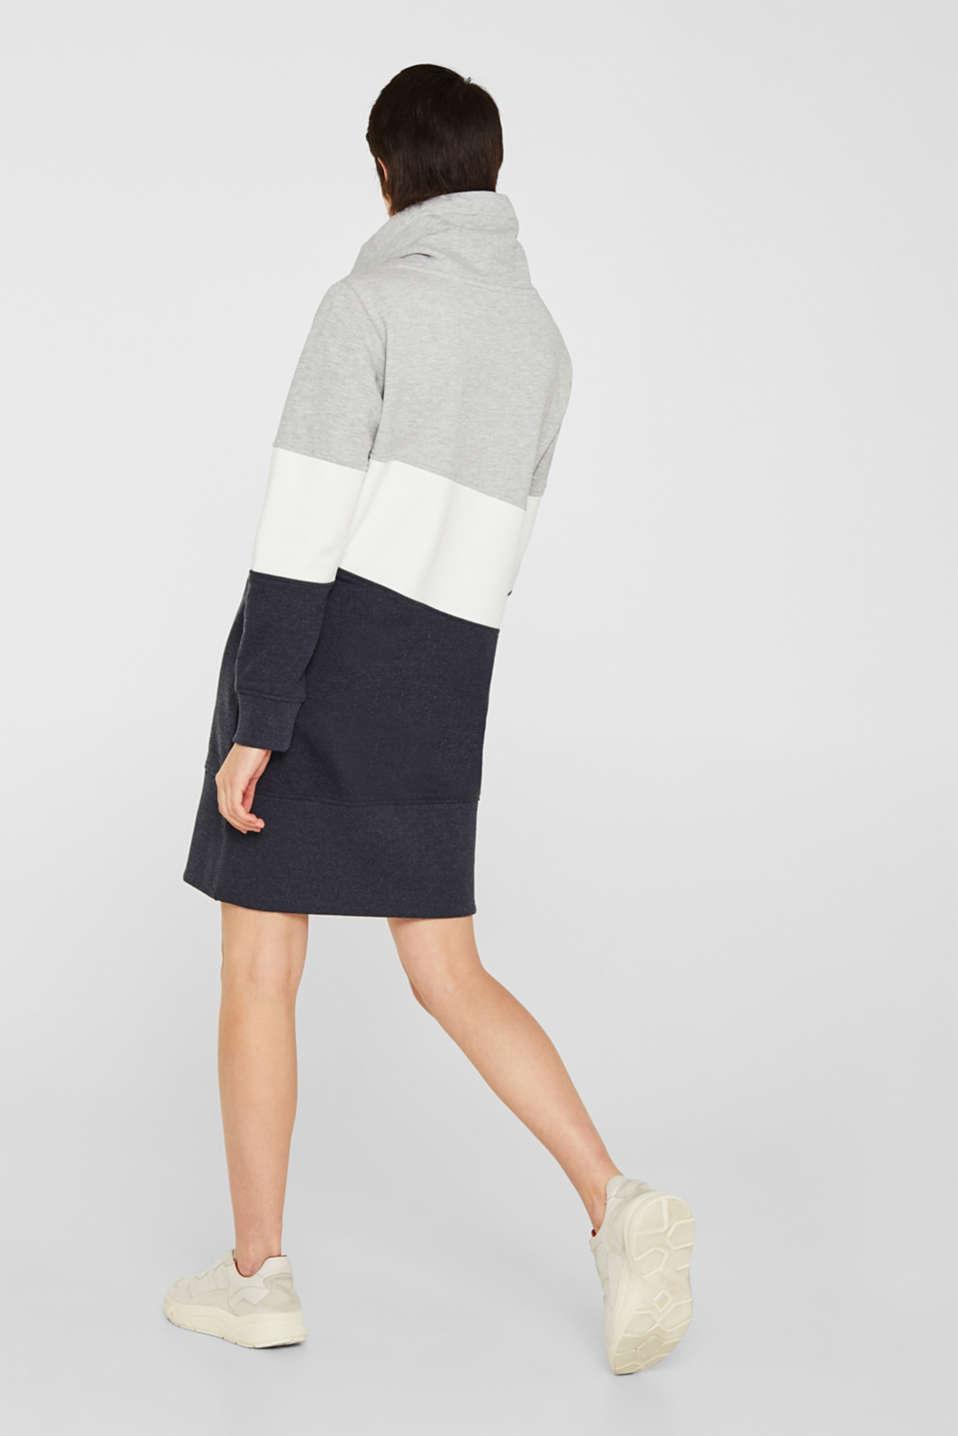 Dresses knitted, LIGHT GREY 5, detail image number 2